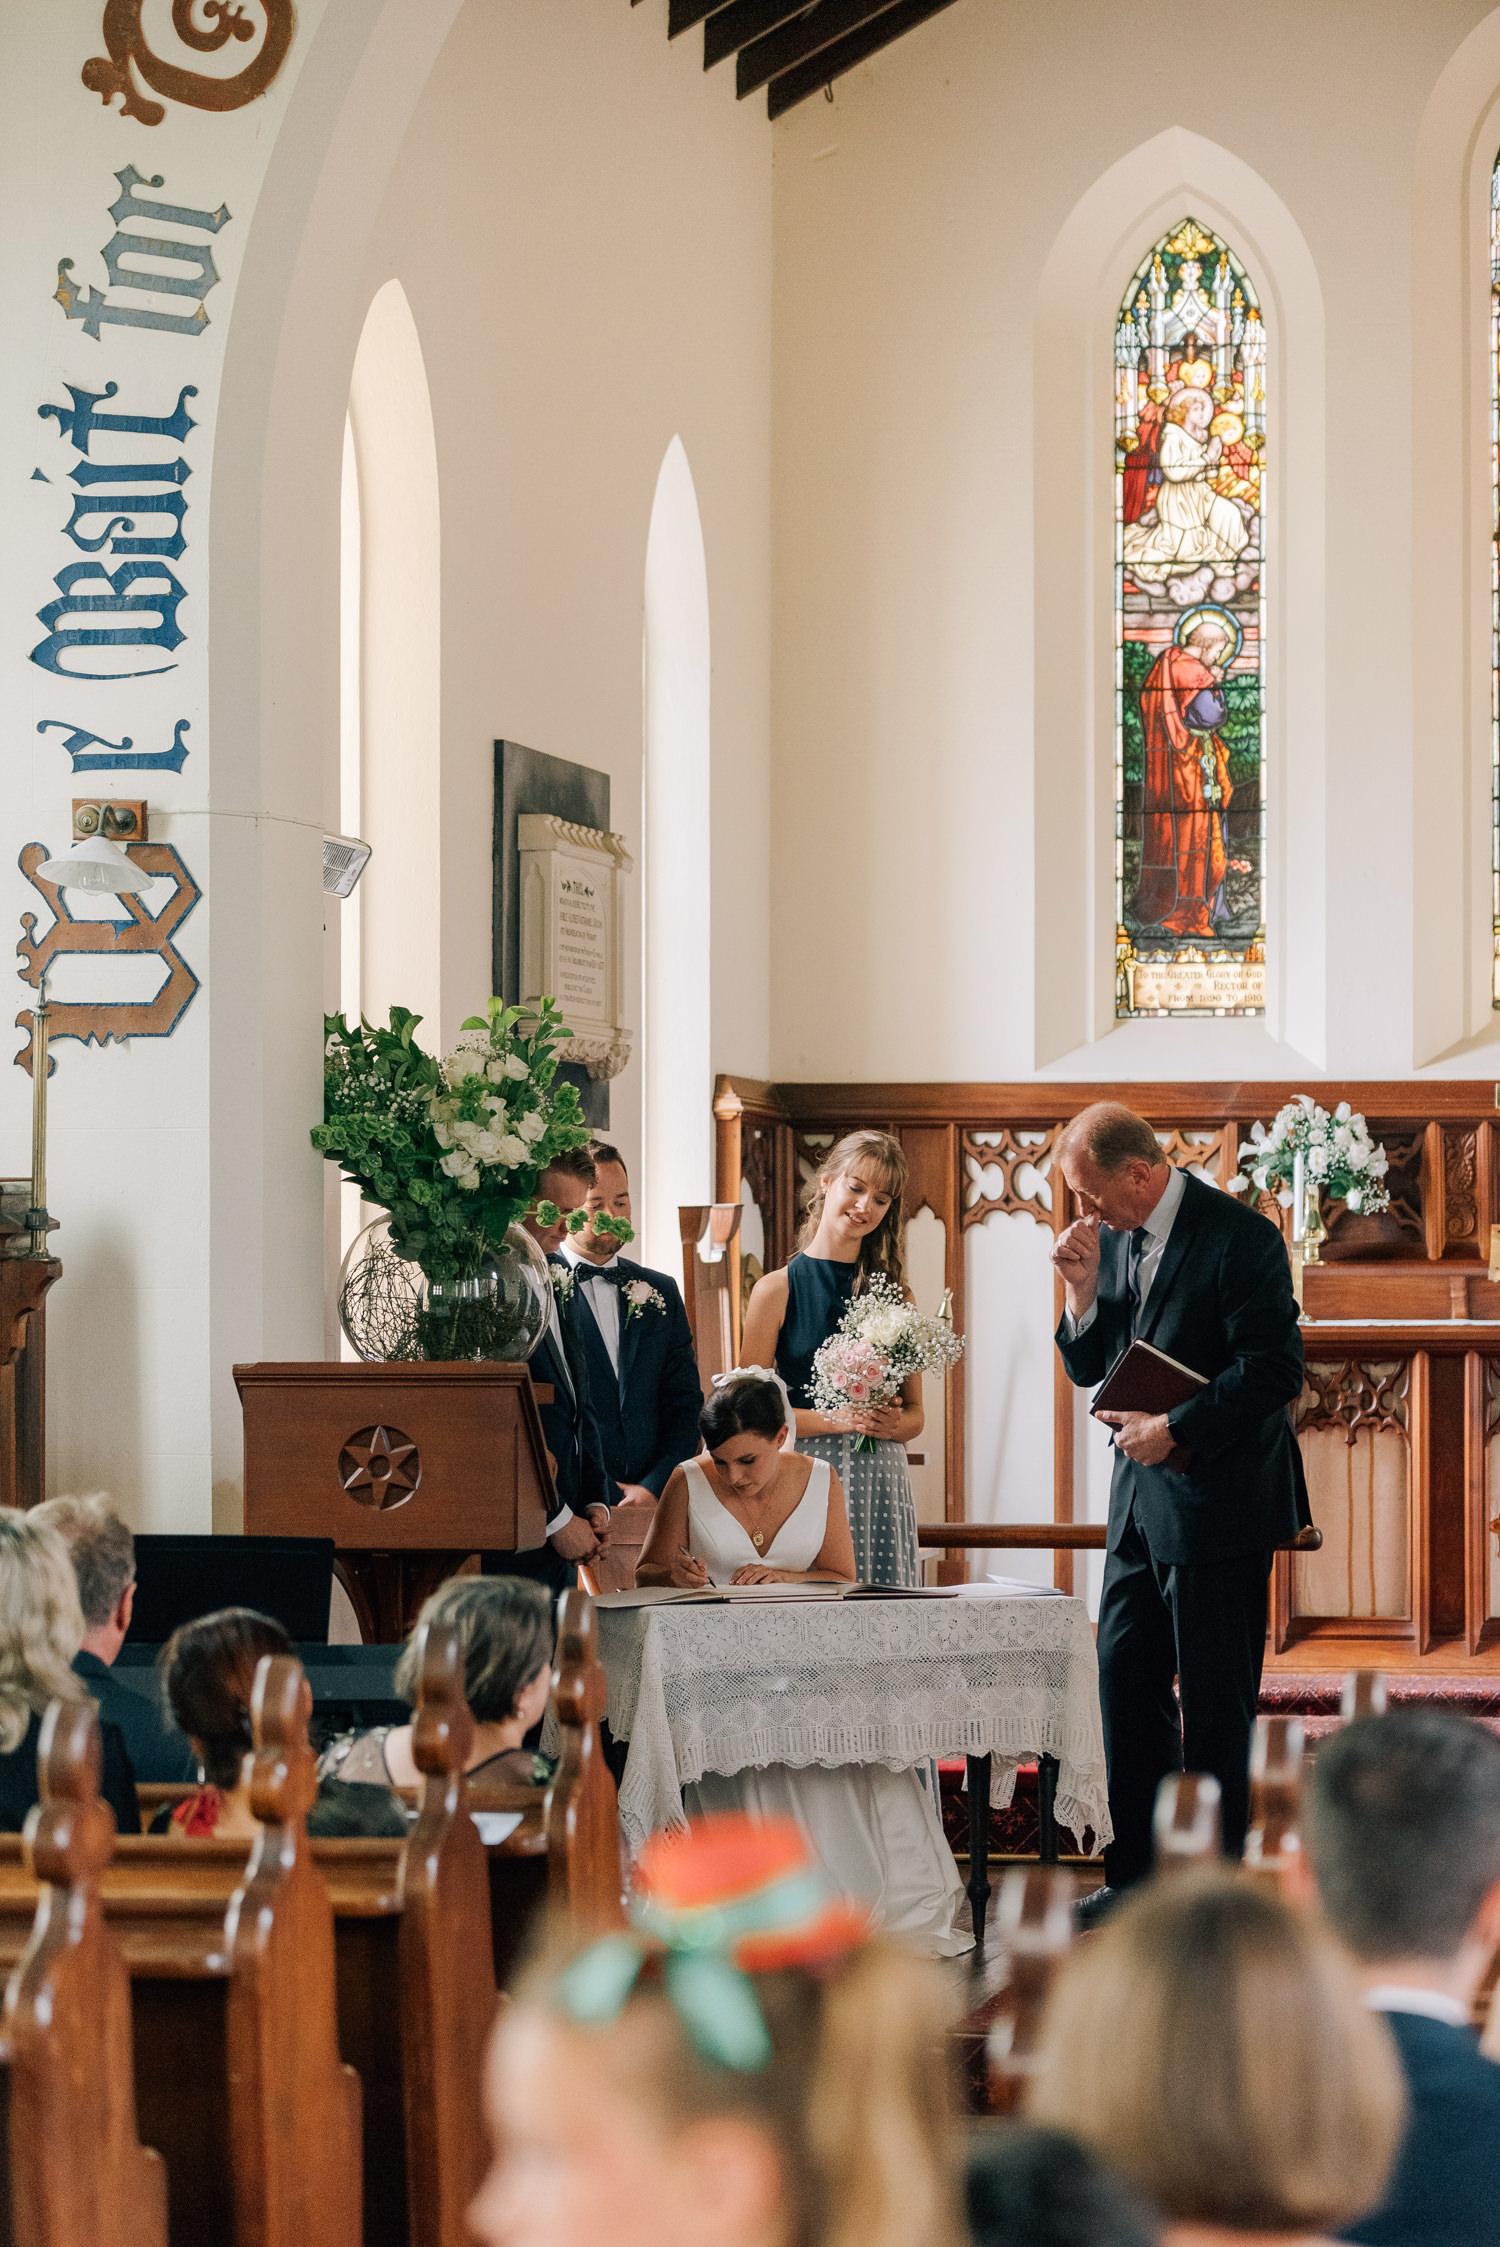 Josef-Chromy-Wedding-Photographer-34.jpg